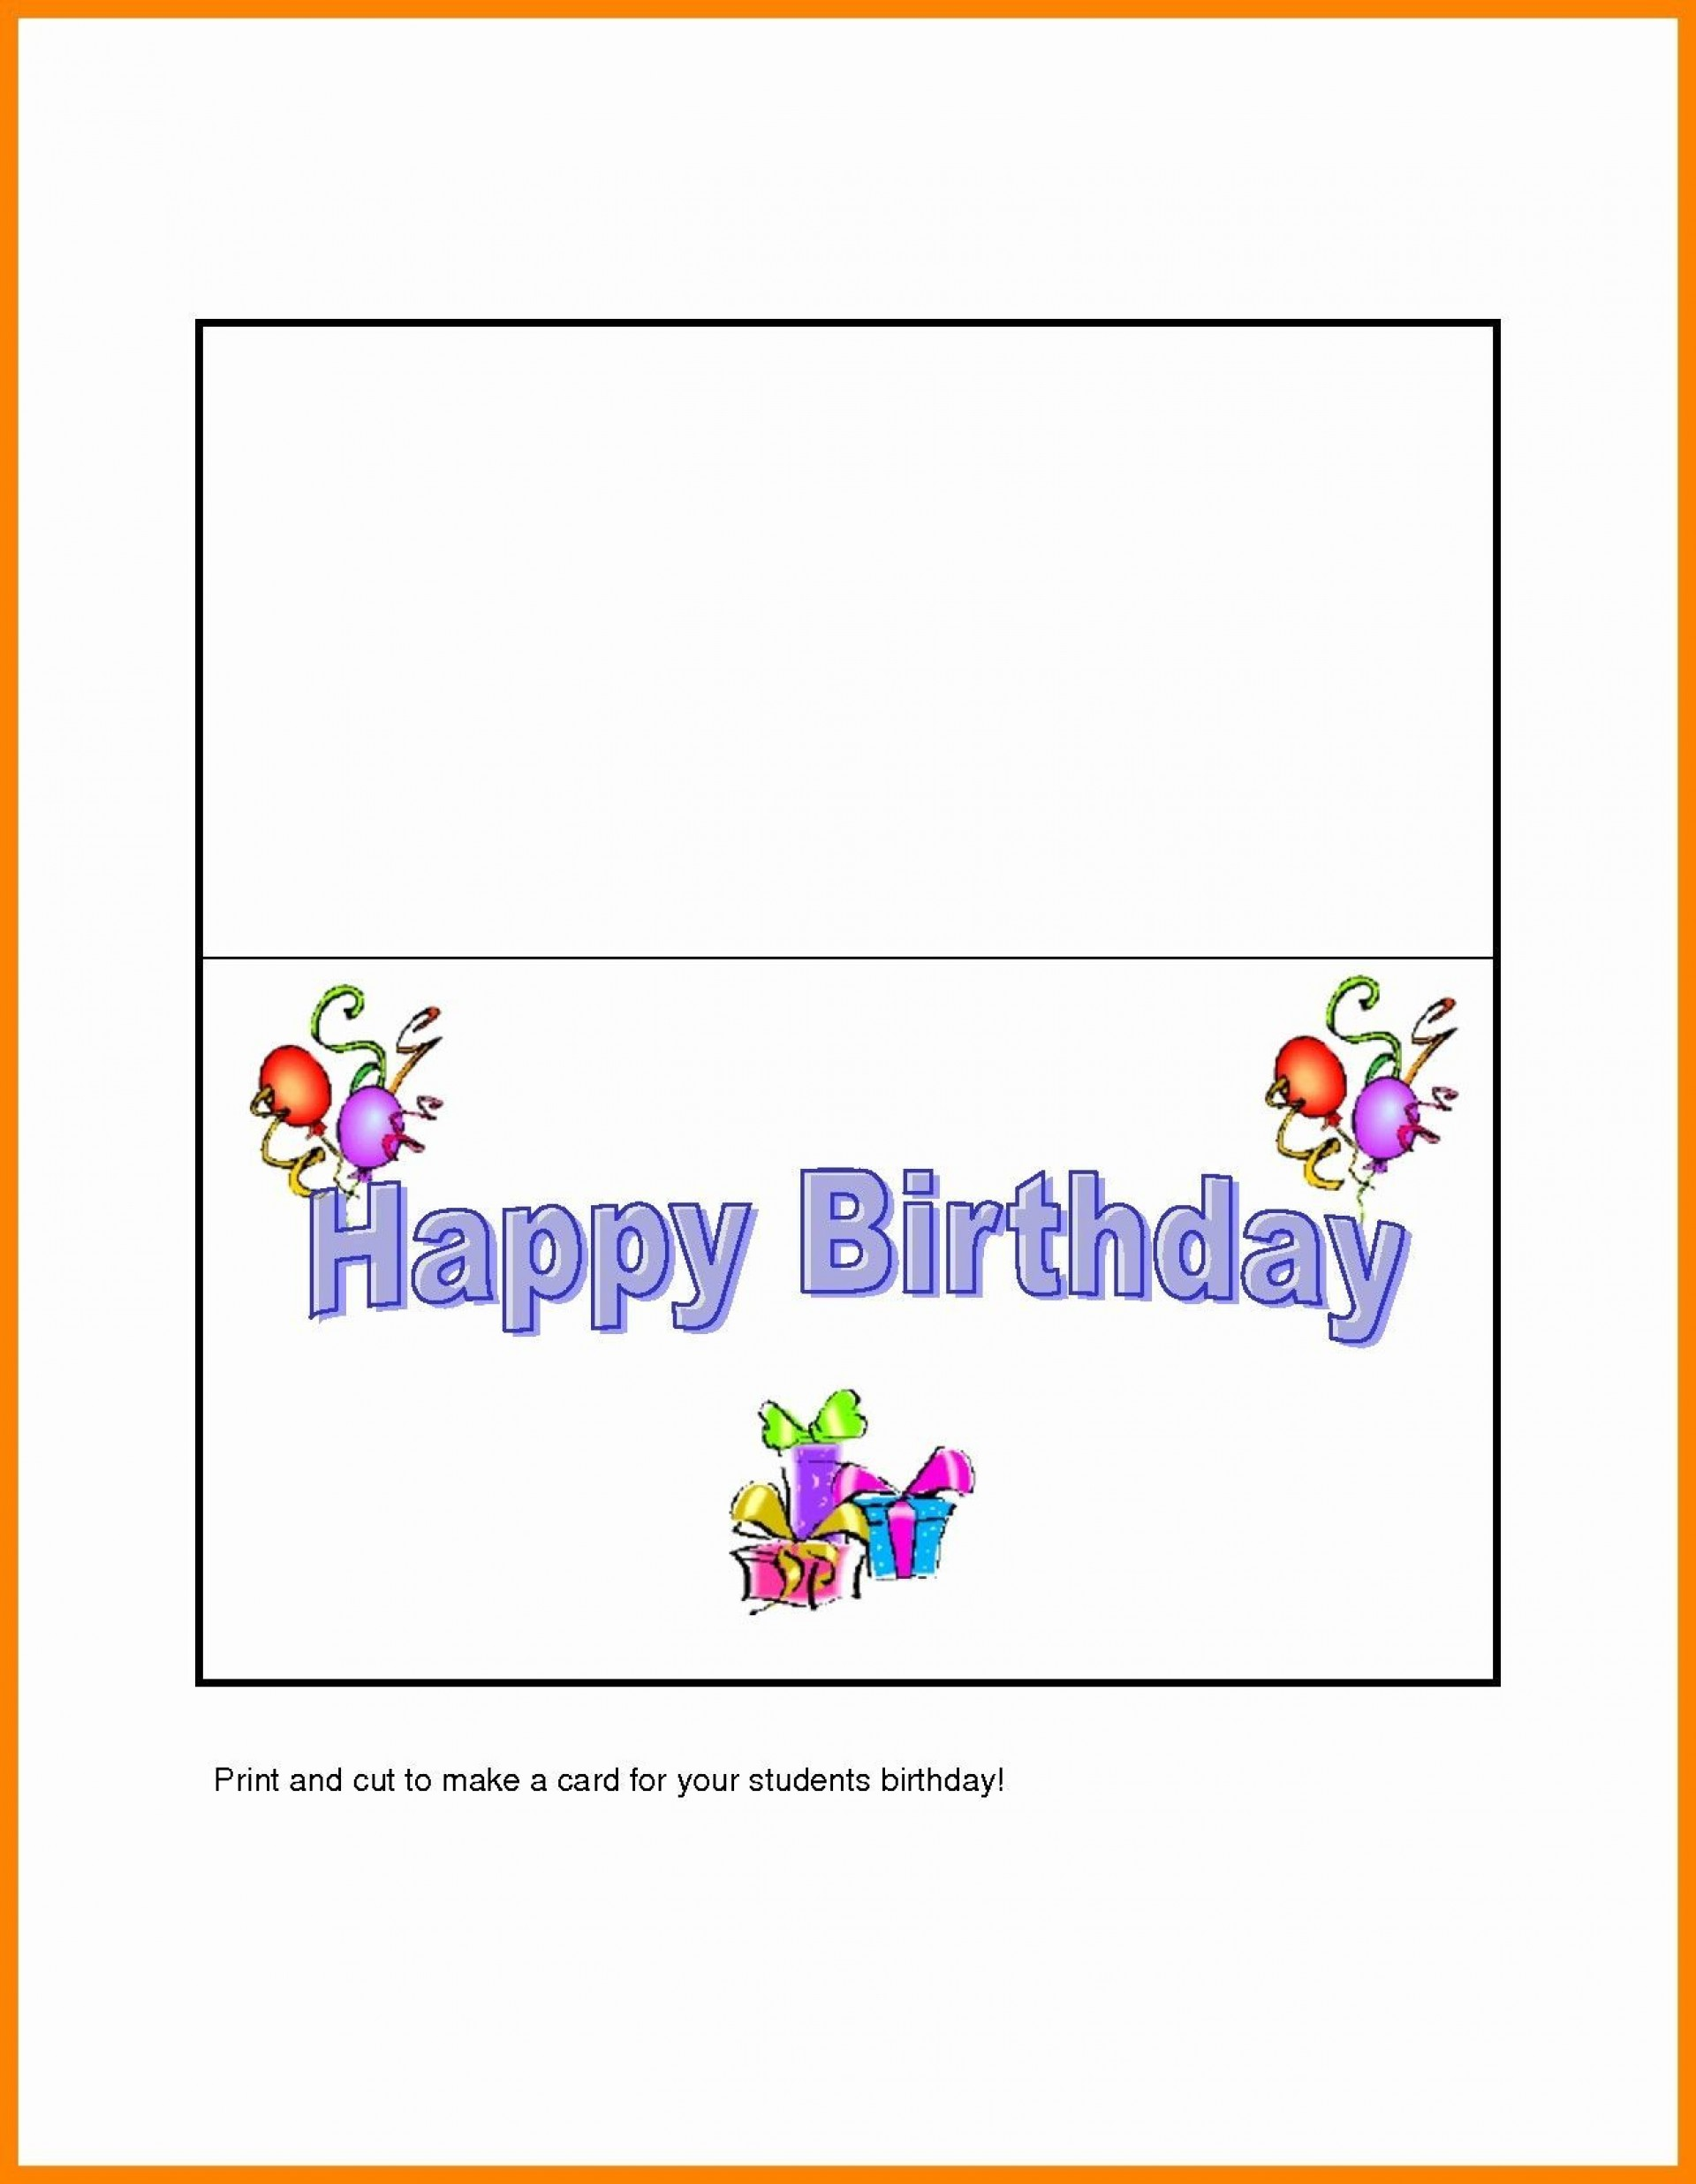 004 Rare Birthday Card Template Word Quarter Fold High Def 1920